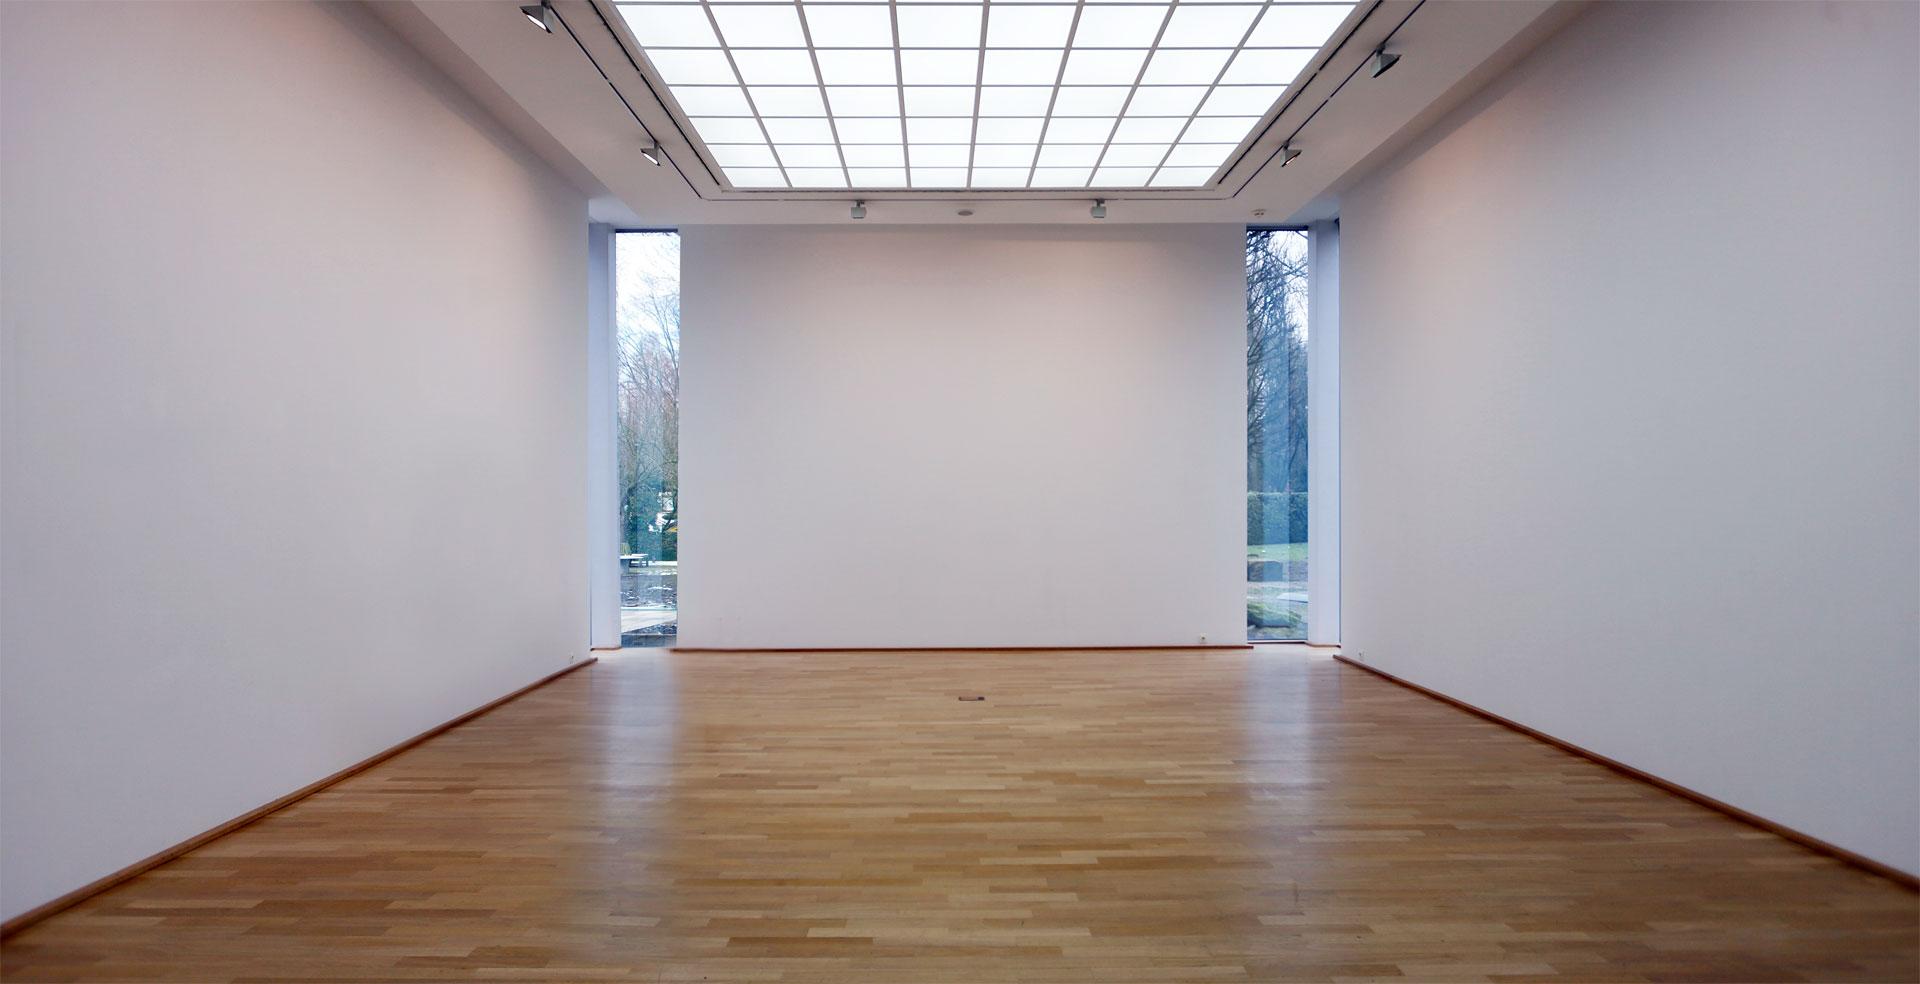 Kunstmuseum Ahlen | Ausstellungsraum | EG Neubau